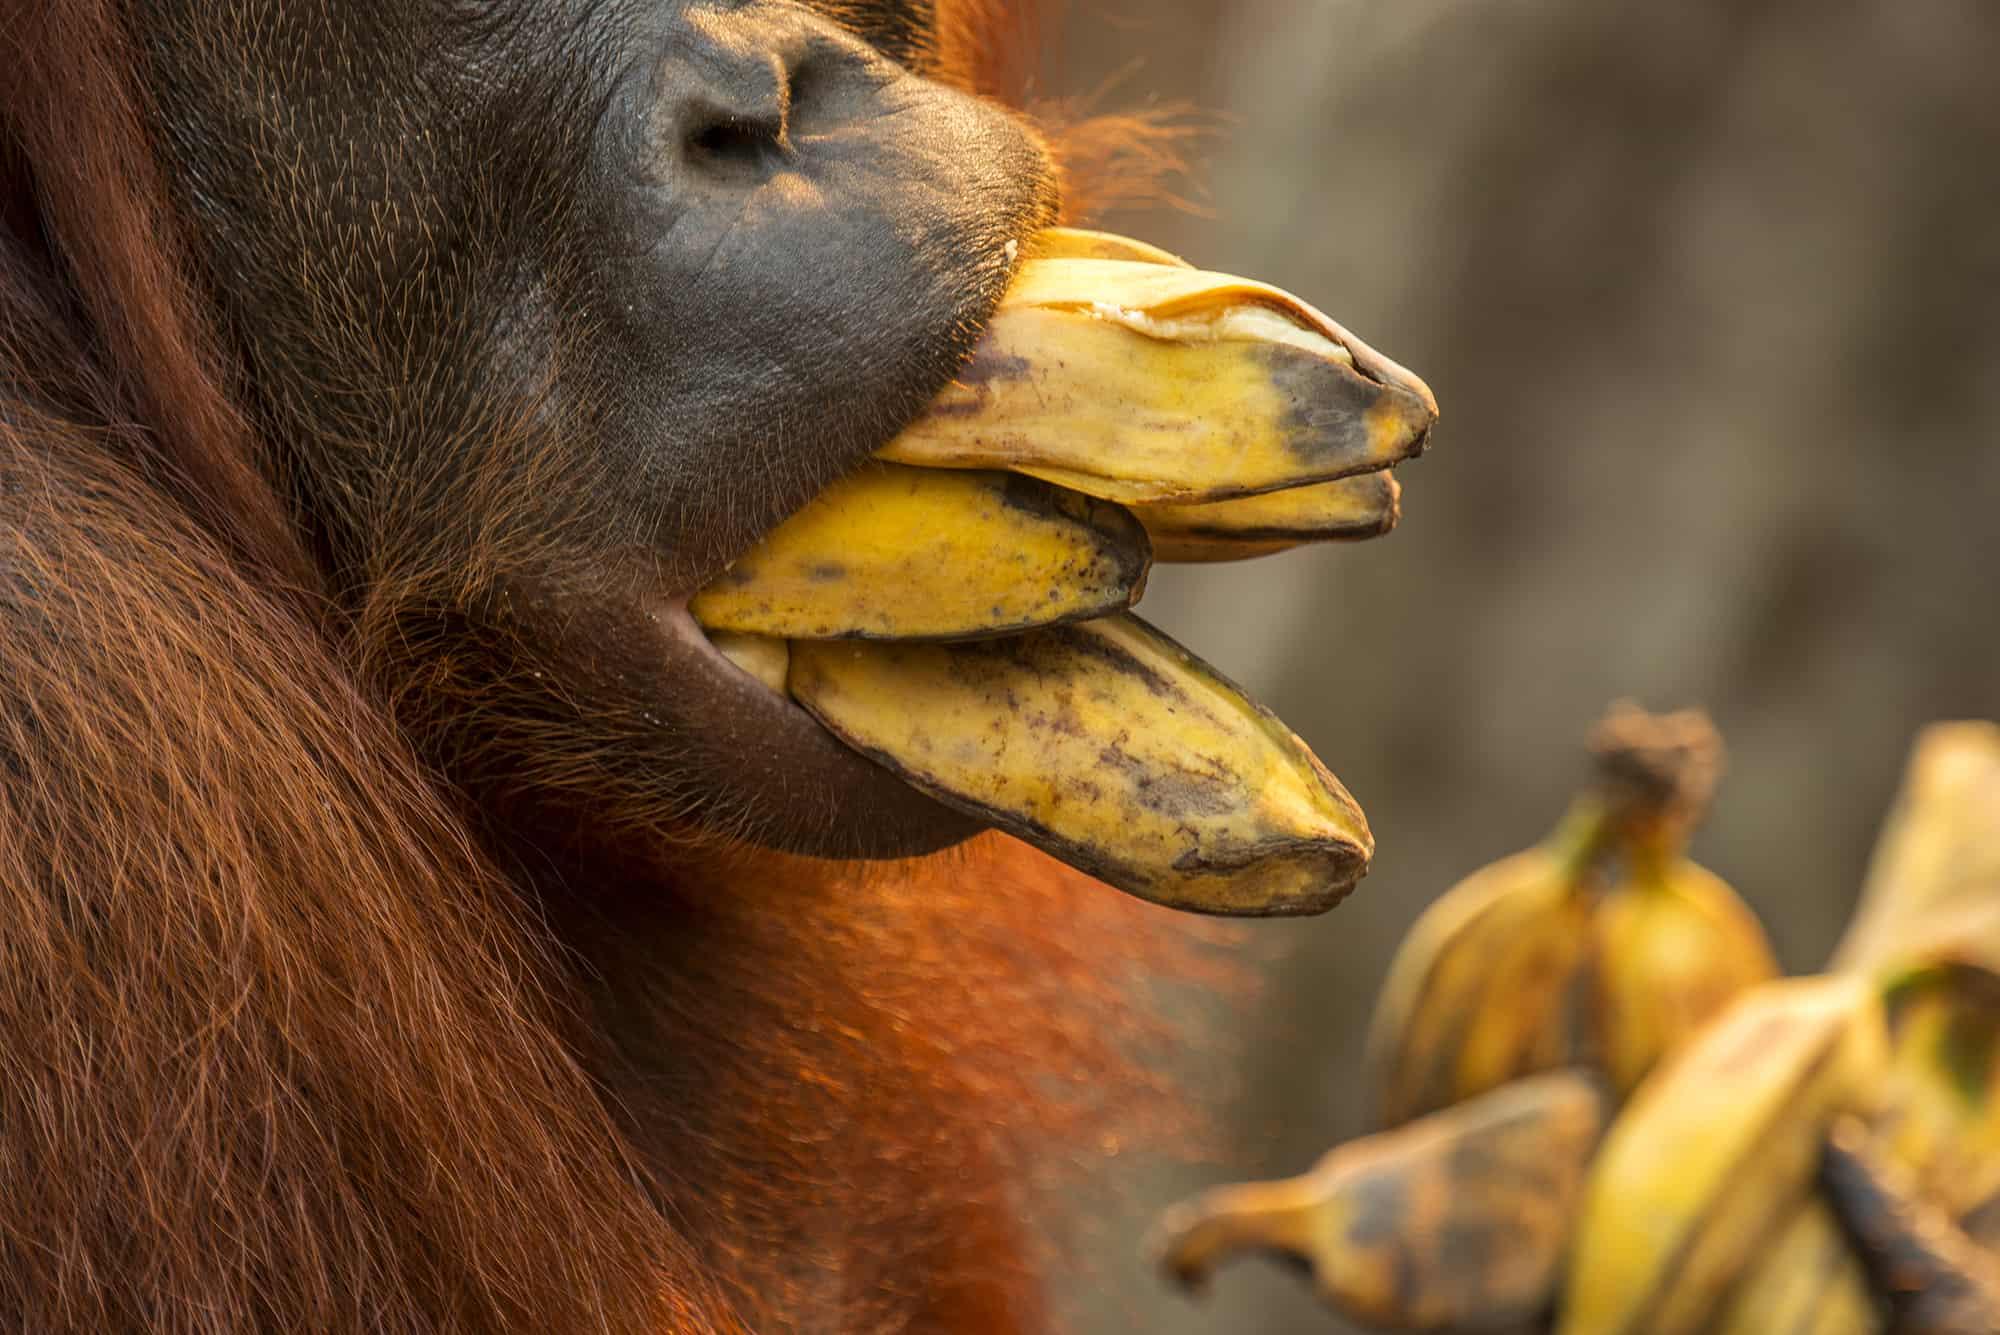 Mouth of orangutan eating bananas in Borneo